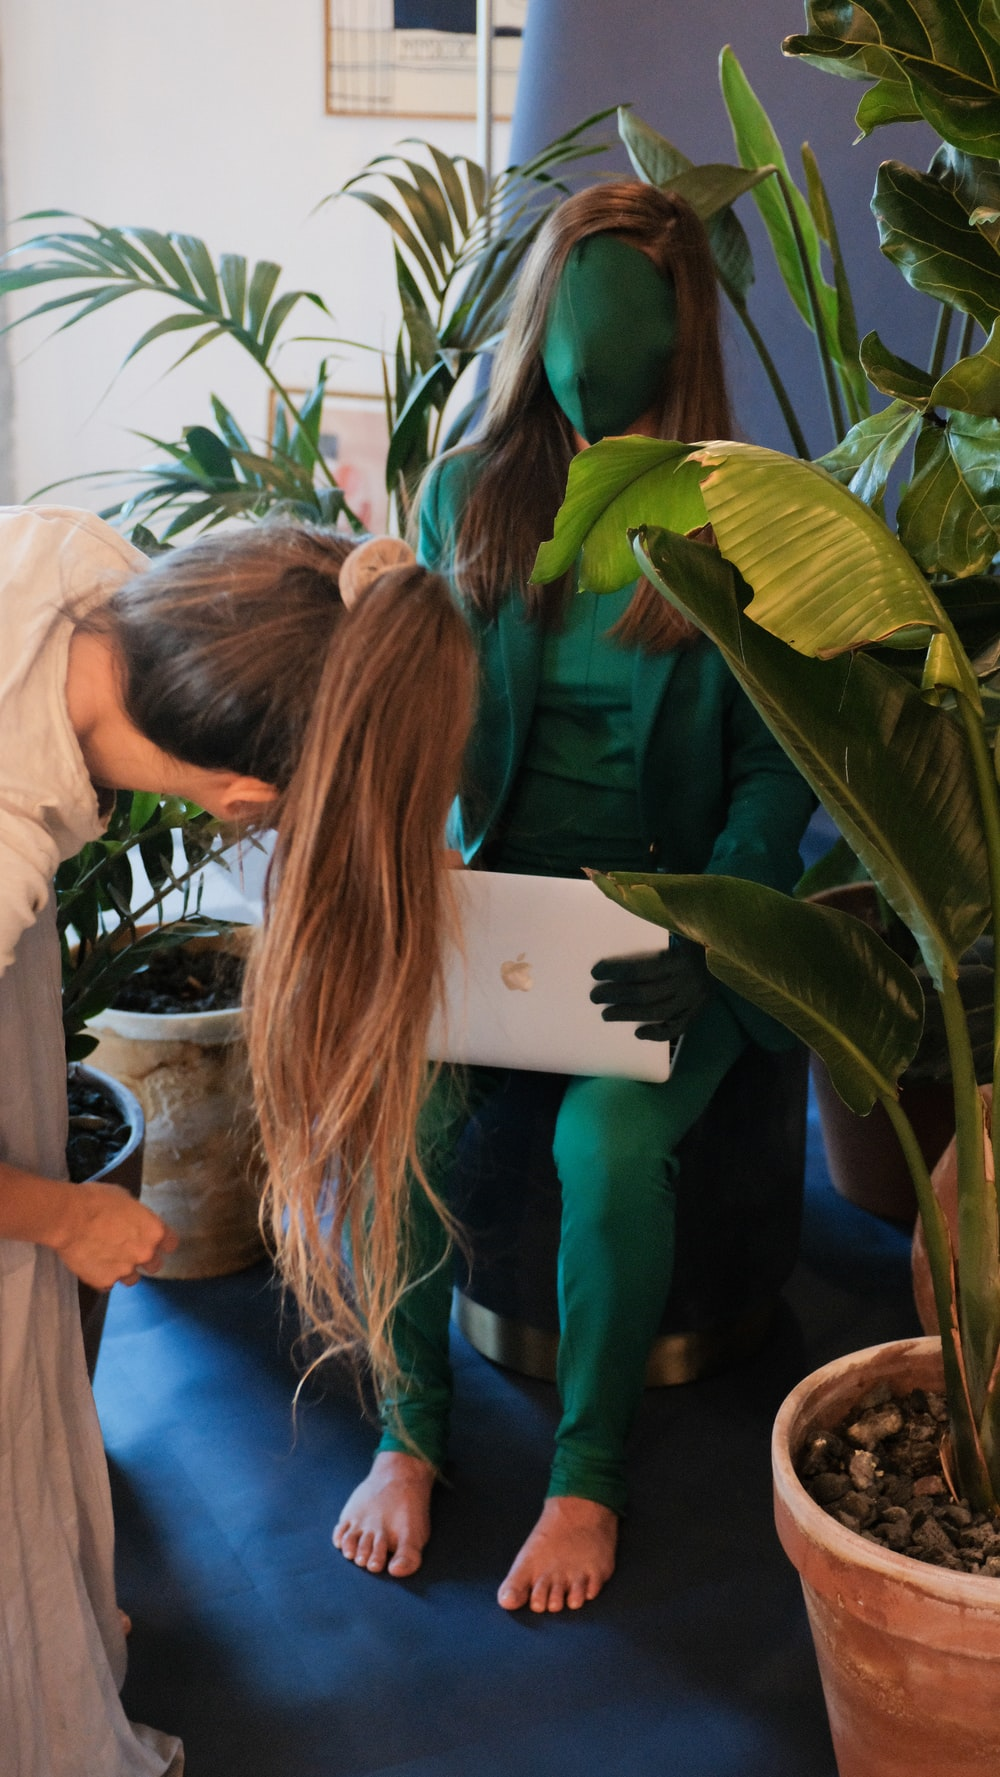 woman in green shirt standing beside green plant